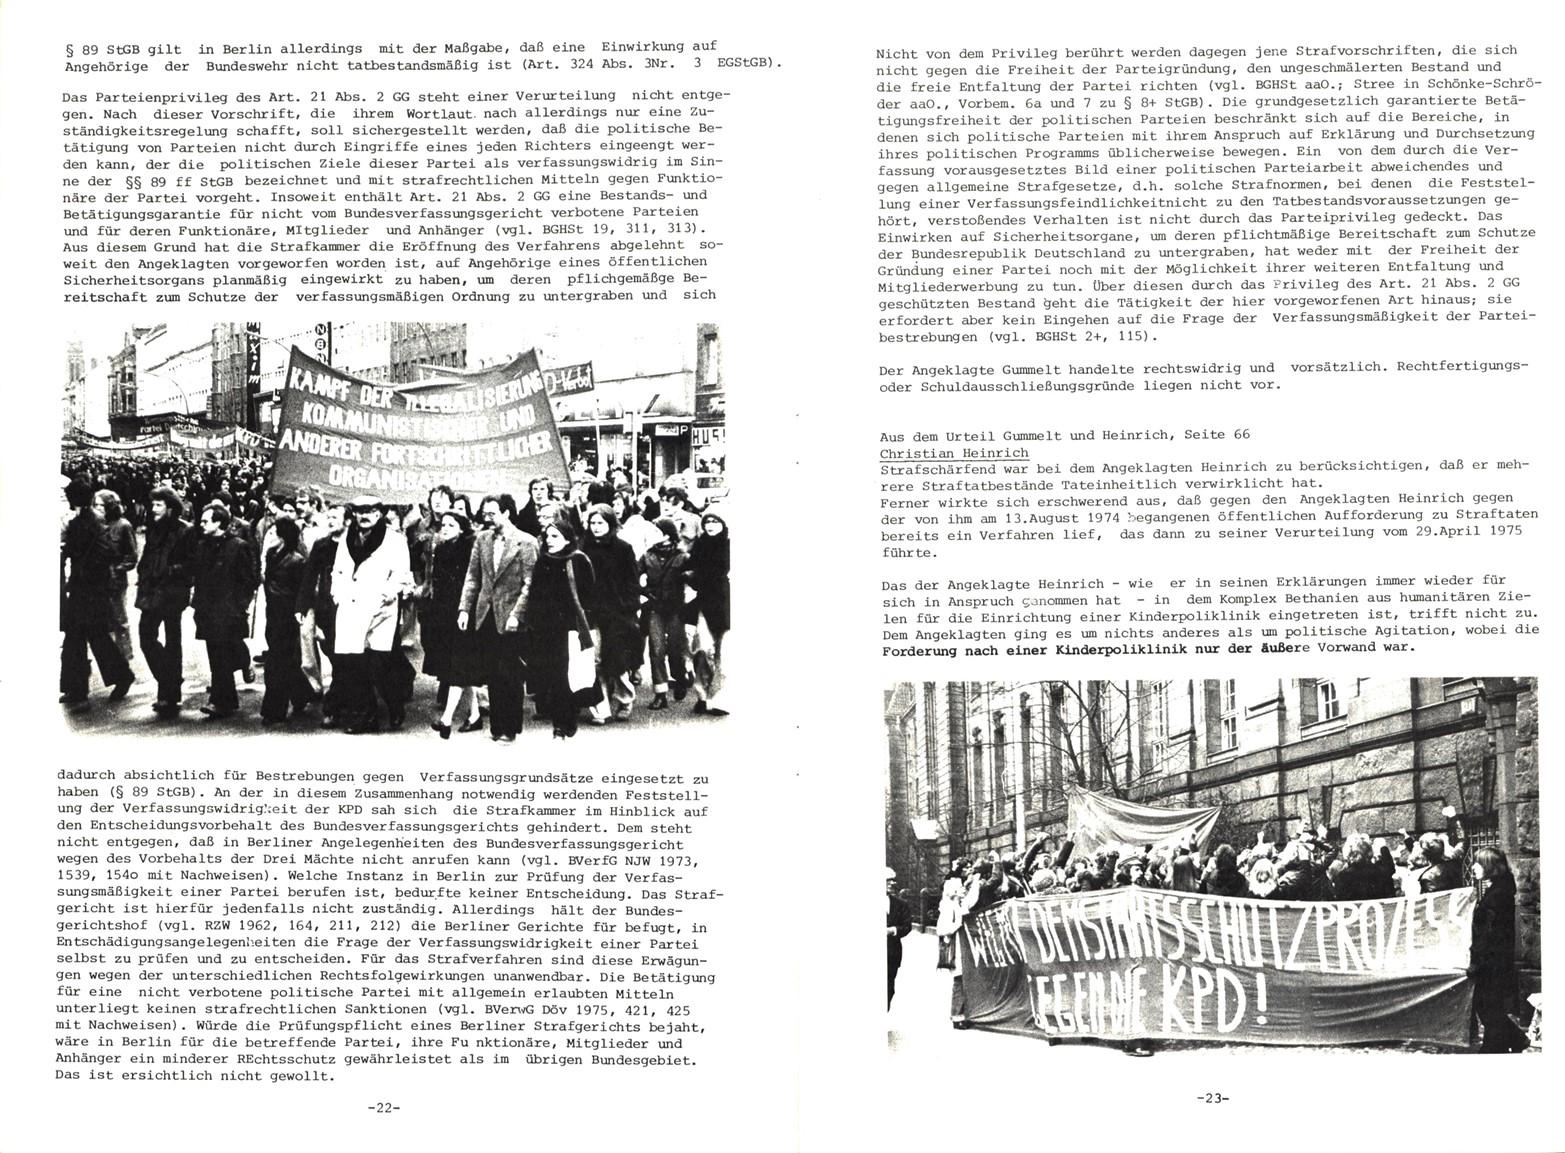 KPDAO_1976_Staatsschutzparagrafen_12